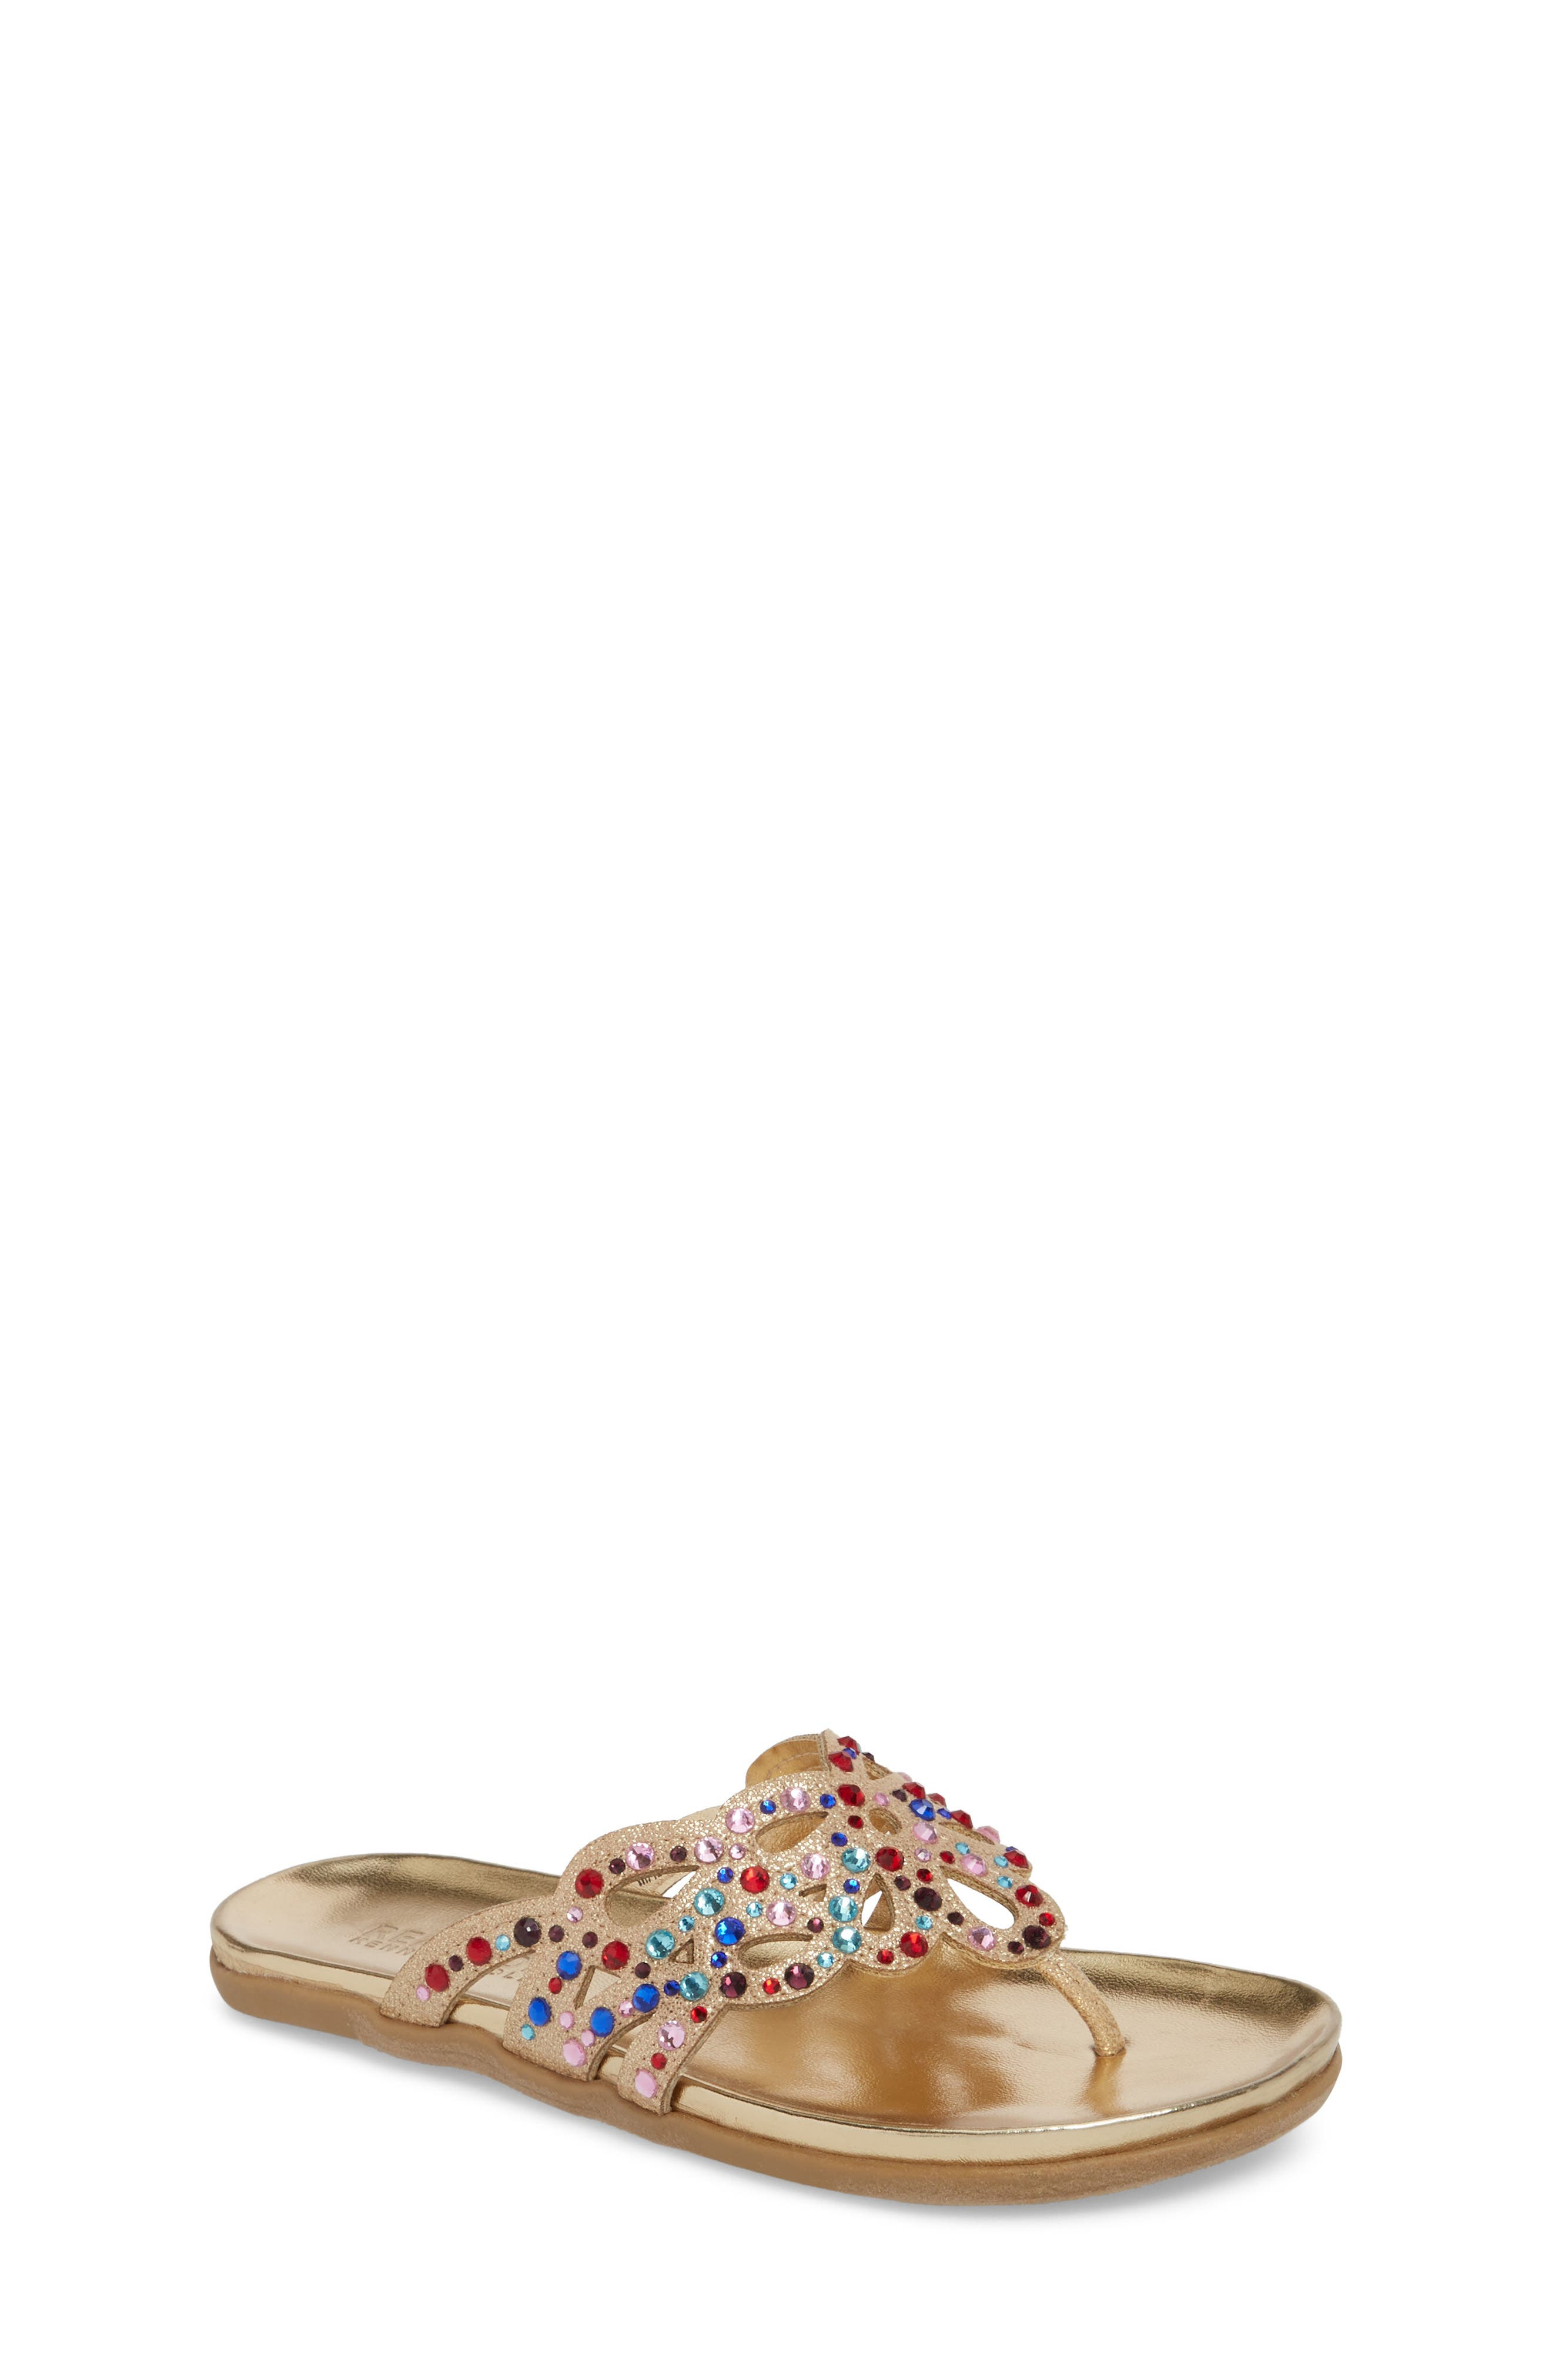 Kenneth Cole New York Flutter Metallic Crystal Thong Sandal (Toddler, Little Kid & Big Kid)